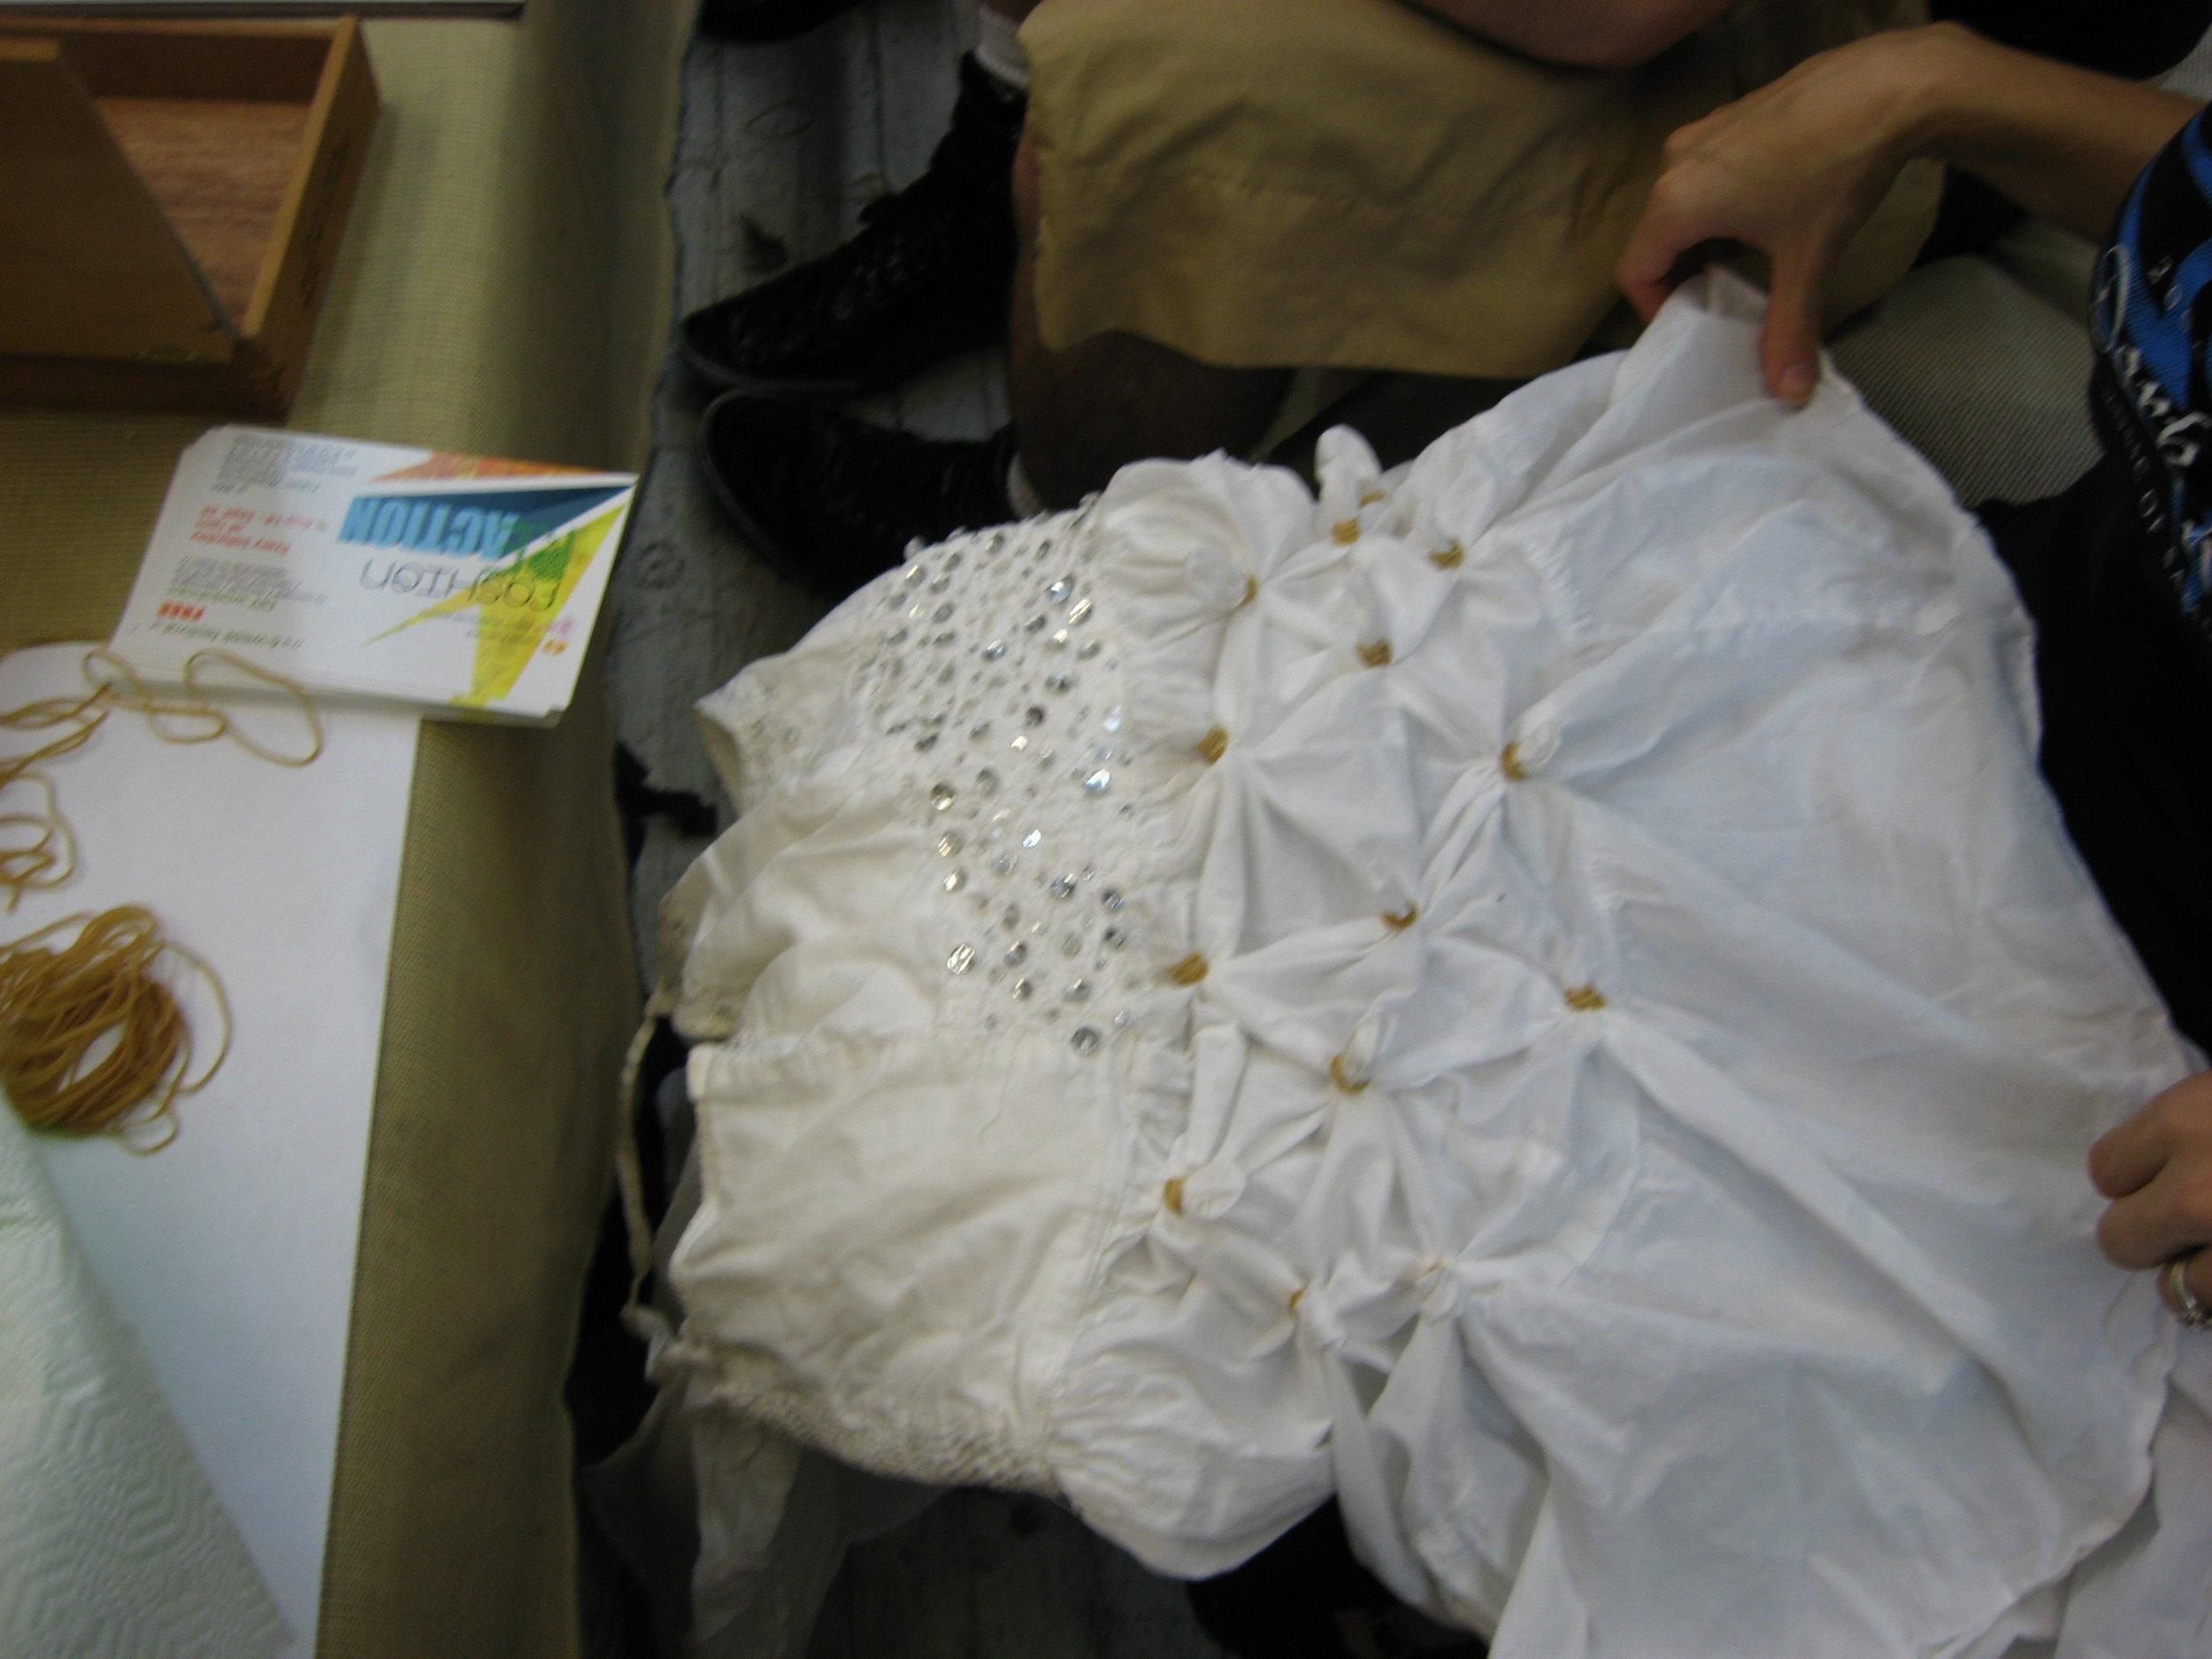 preparing-another-dress_5060305767_o.jpg